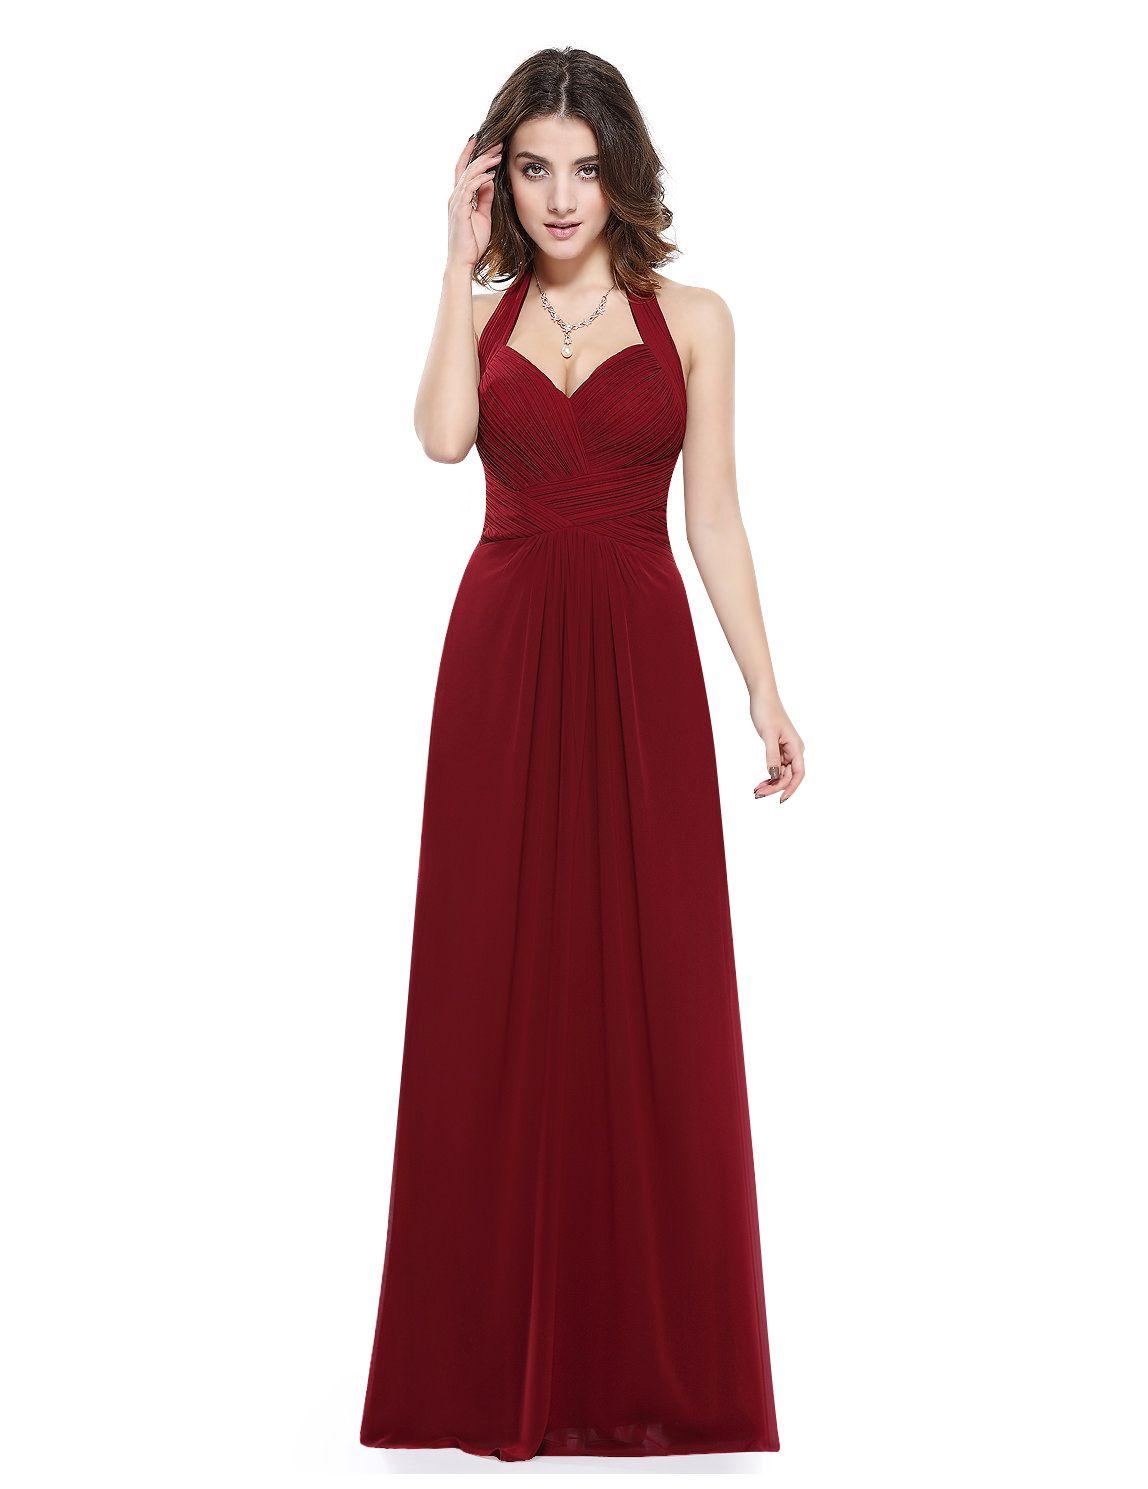 Langes Ballkleid mit Neckholder in Bordeaux Rot  Abendkleid